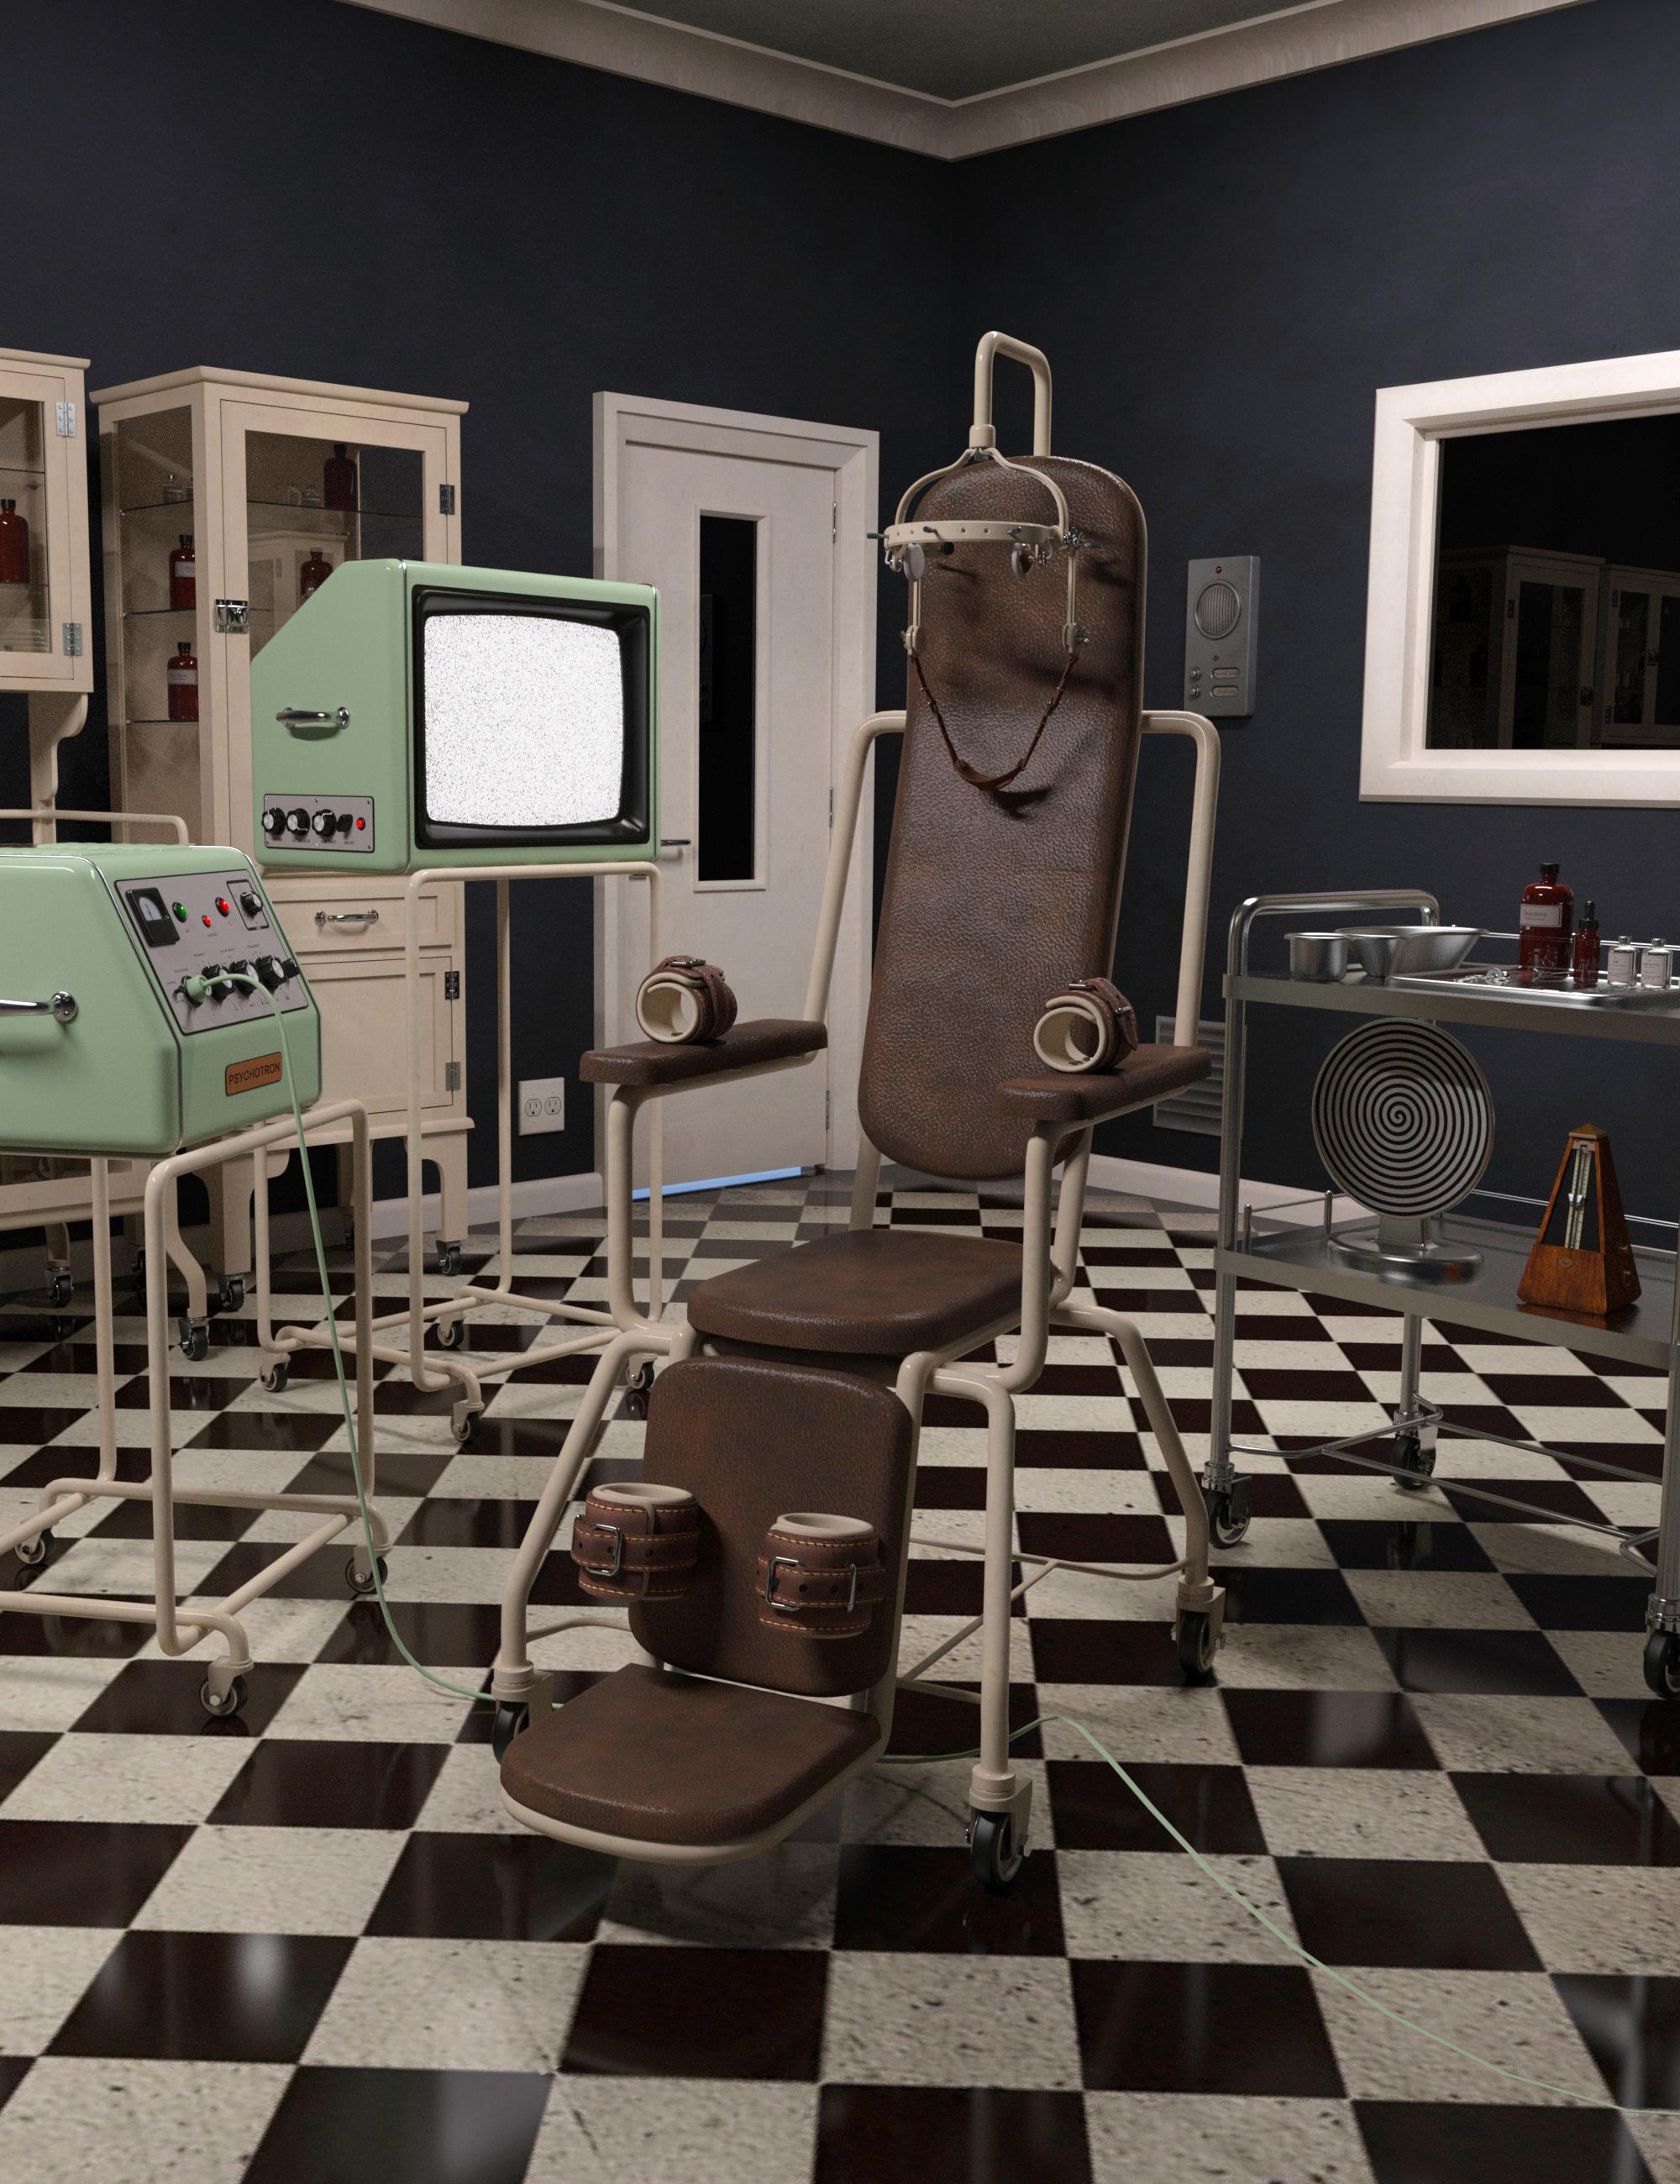 Mind Control Lab by: hypnagogia, 3D Models by Daz 3D